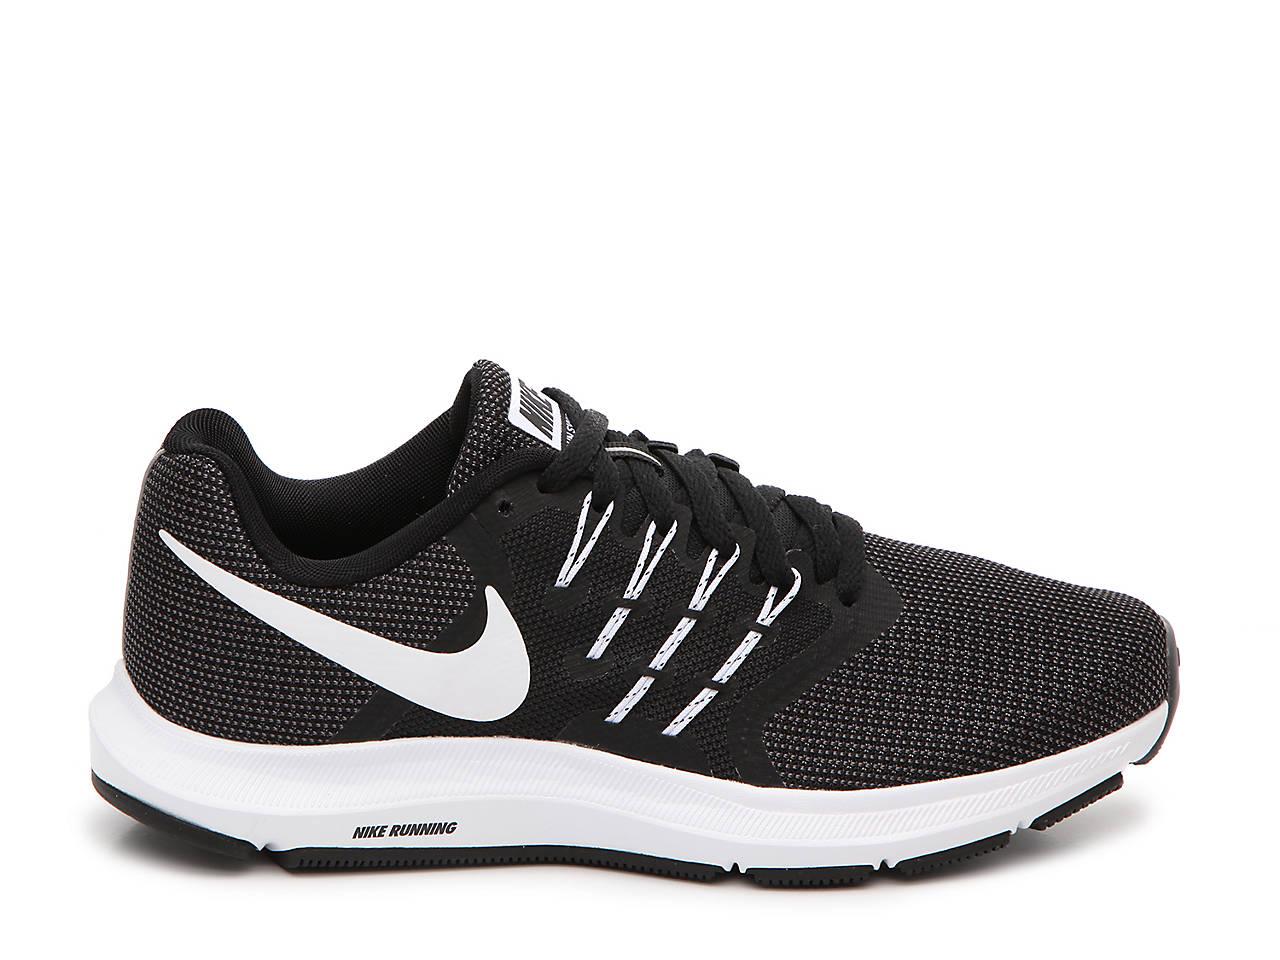 Nike Run Swift Lightweight Running Shoe - Women s Women s Shoes  75f638d60cb73